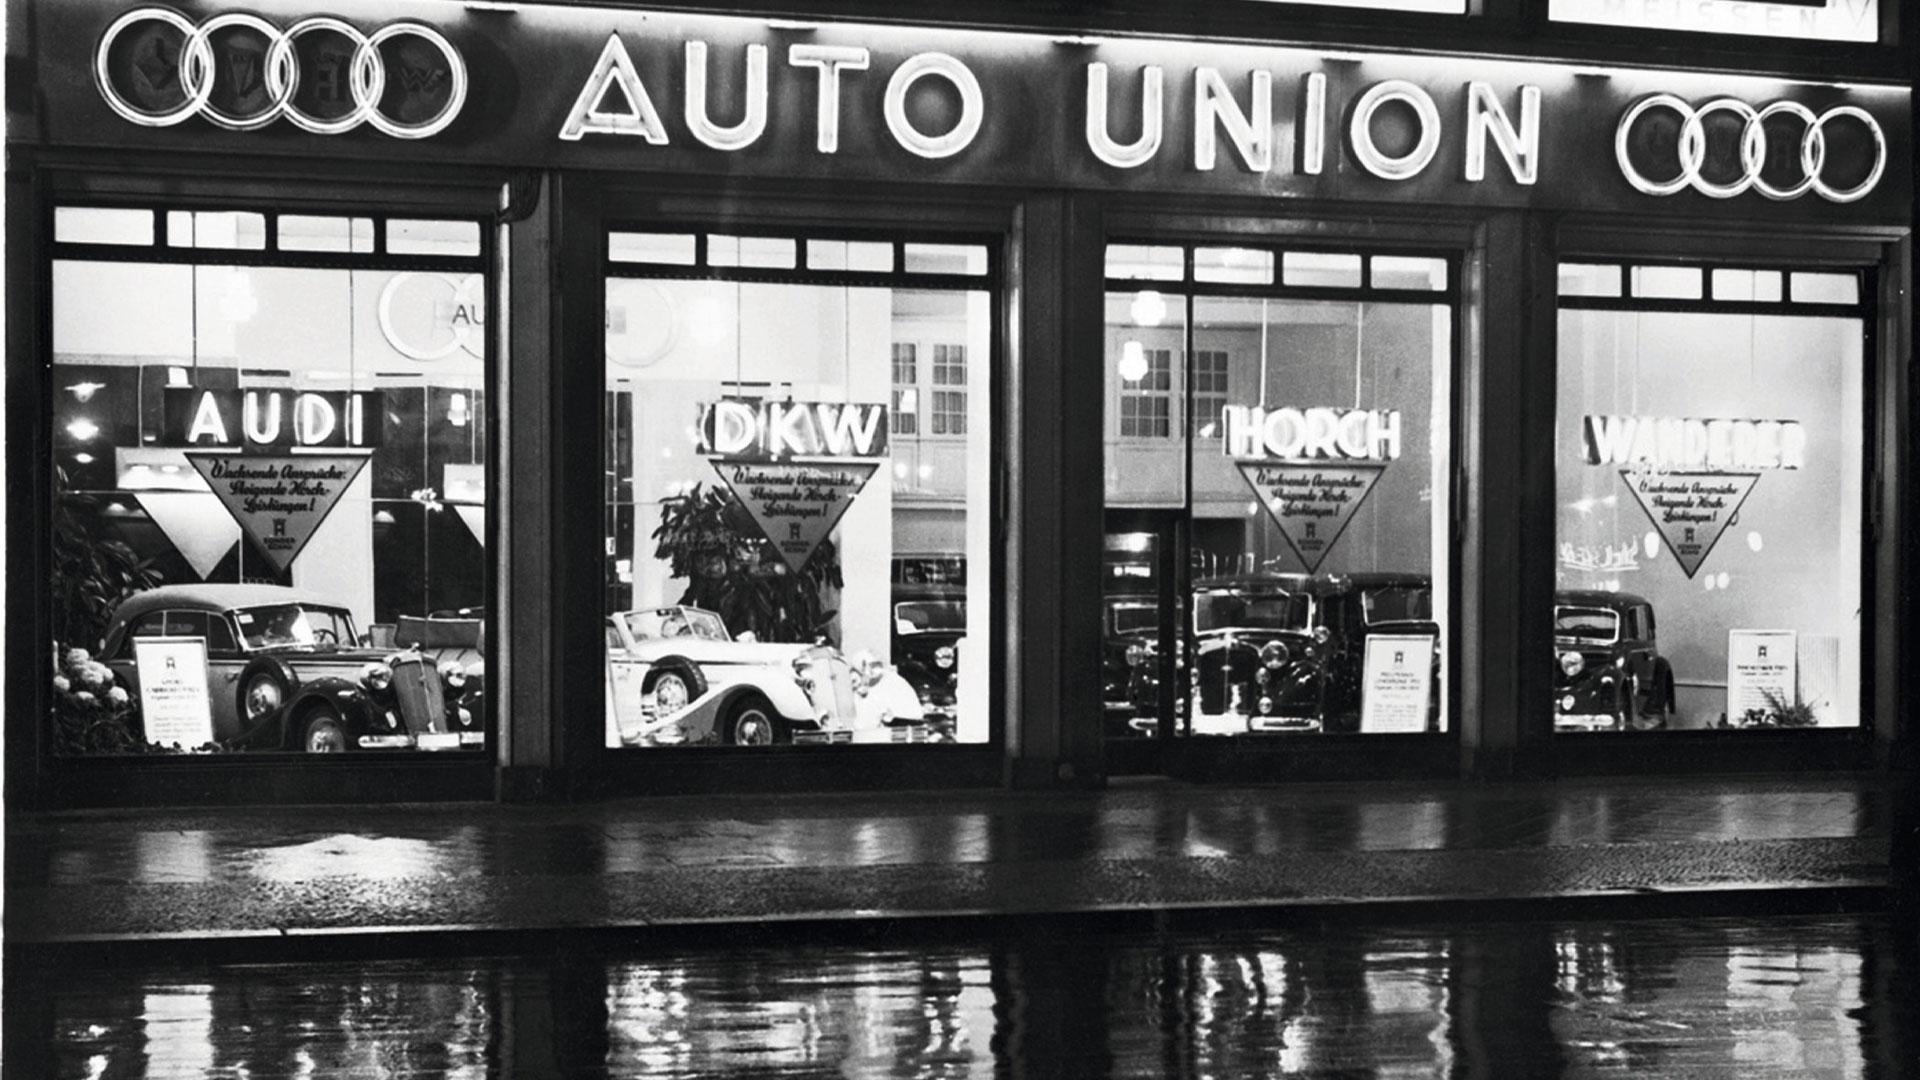 fcpeuro-history-of-audi-auto-union-dealership